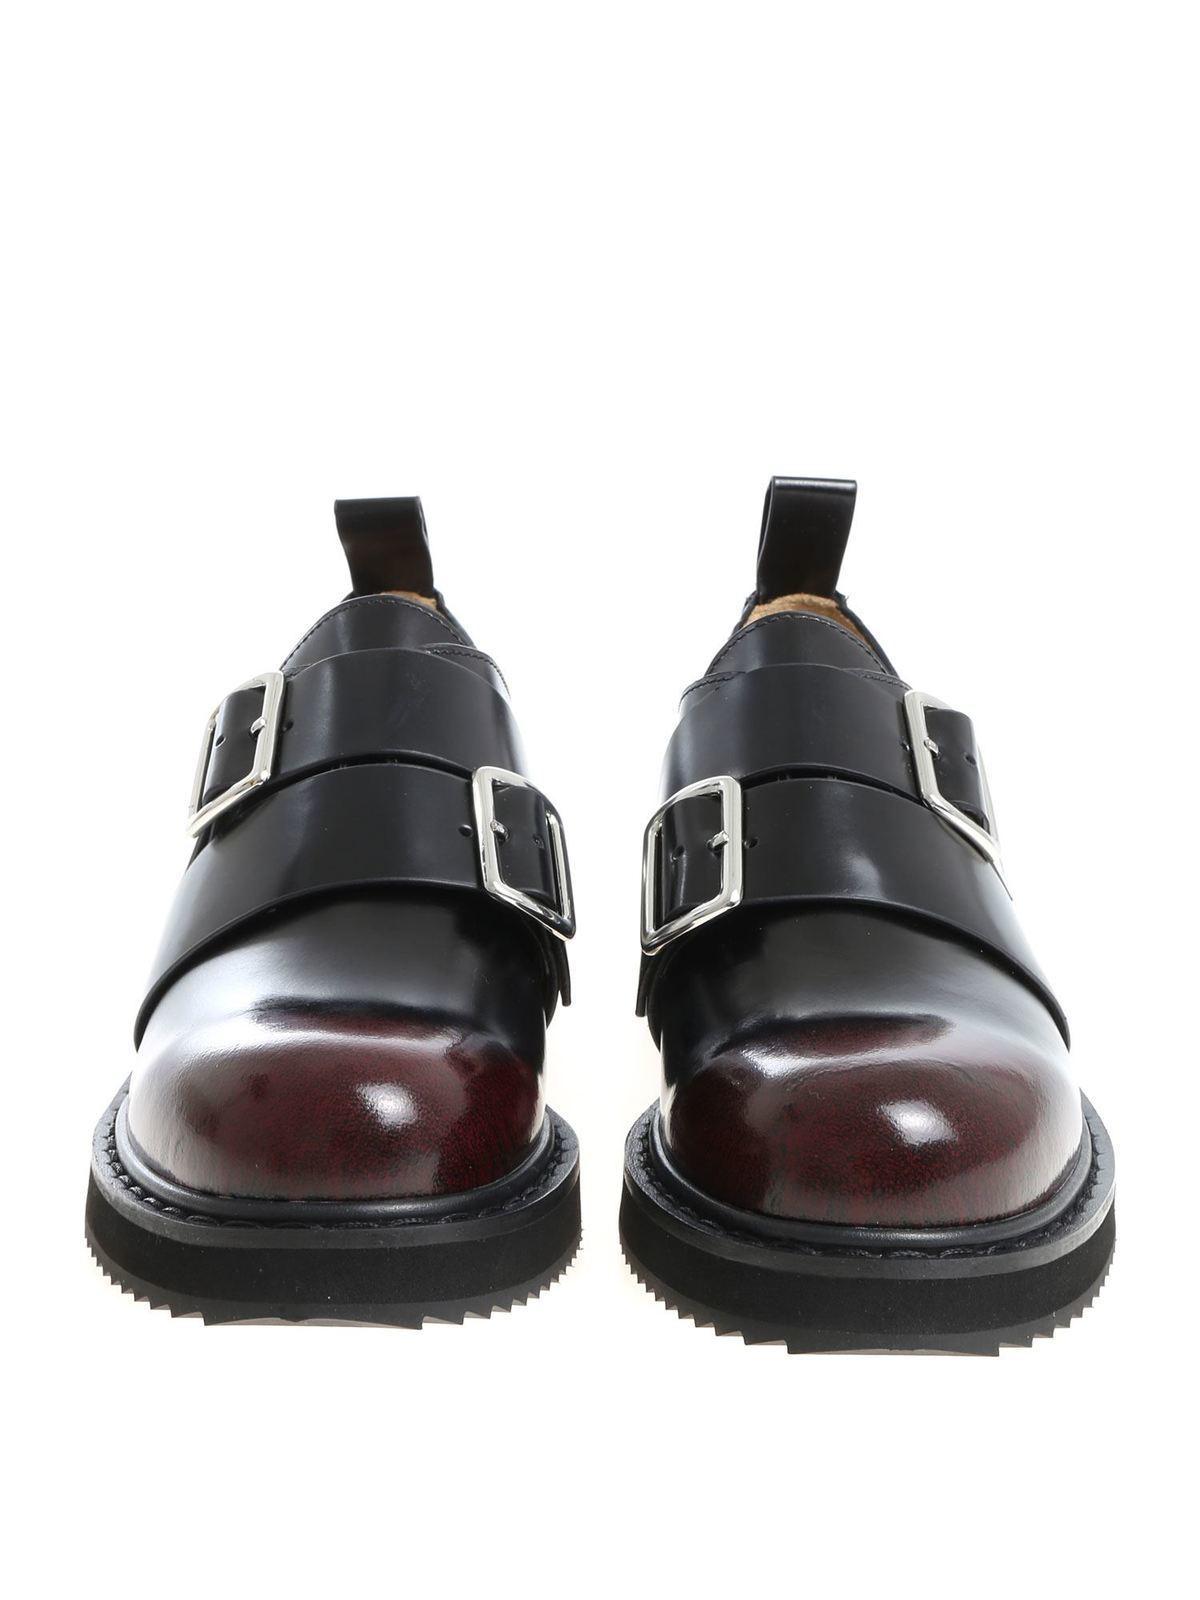 Jil Sander Navy - Black shoes with